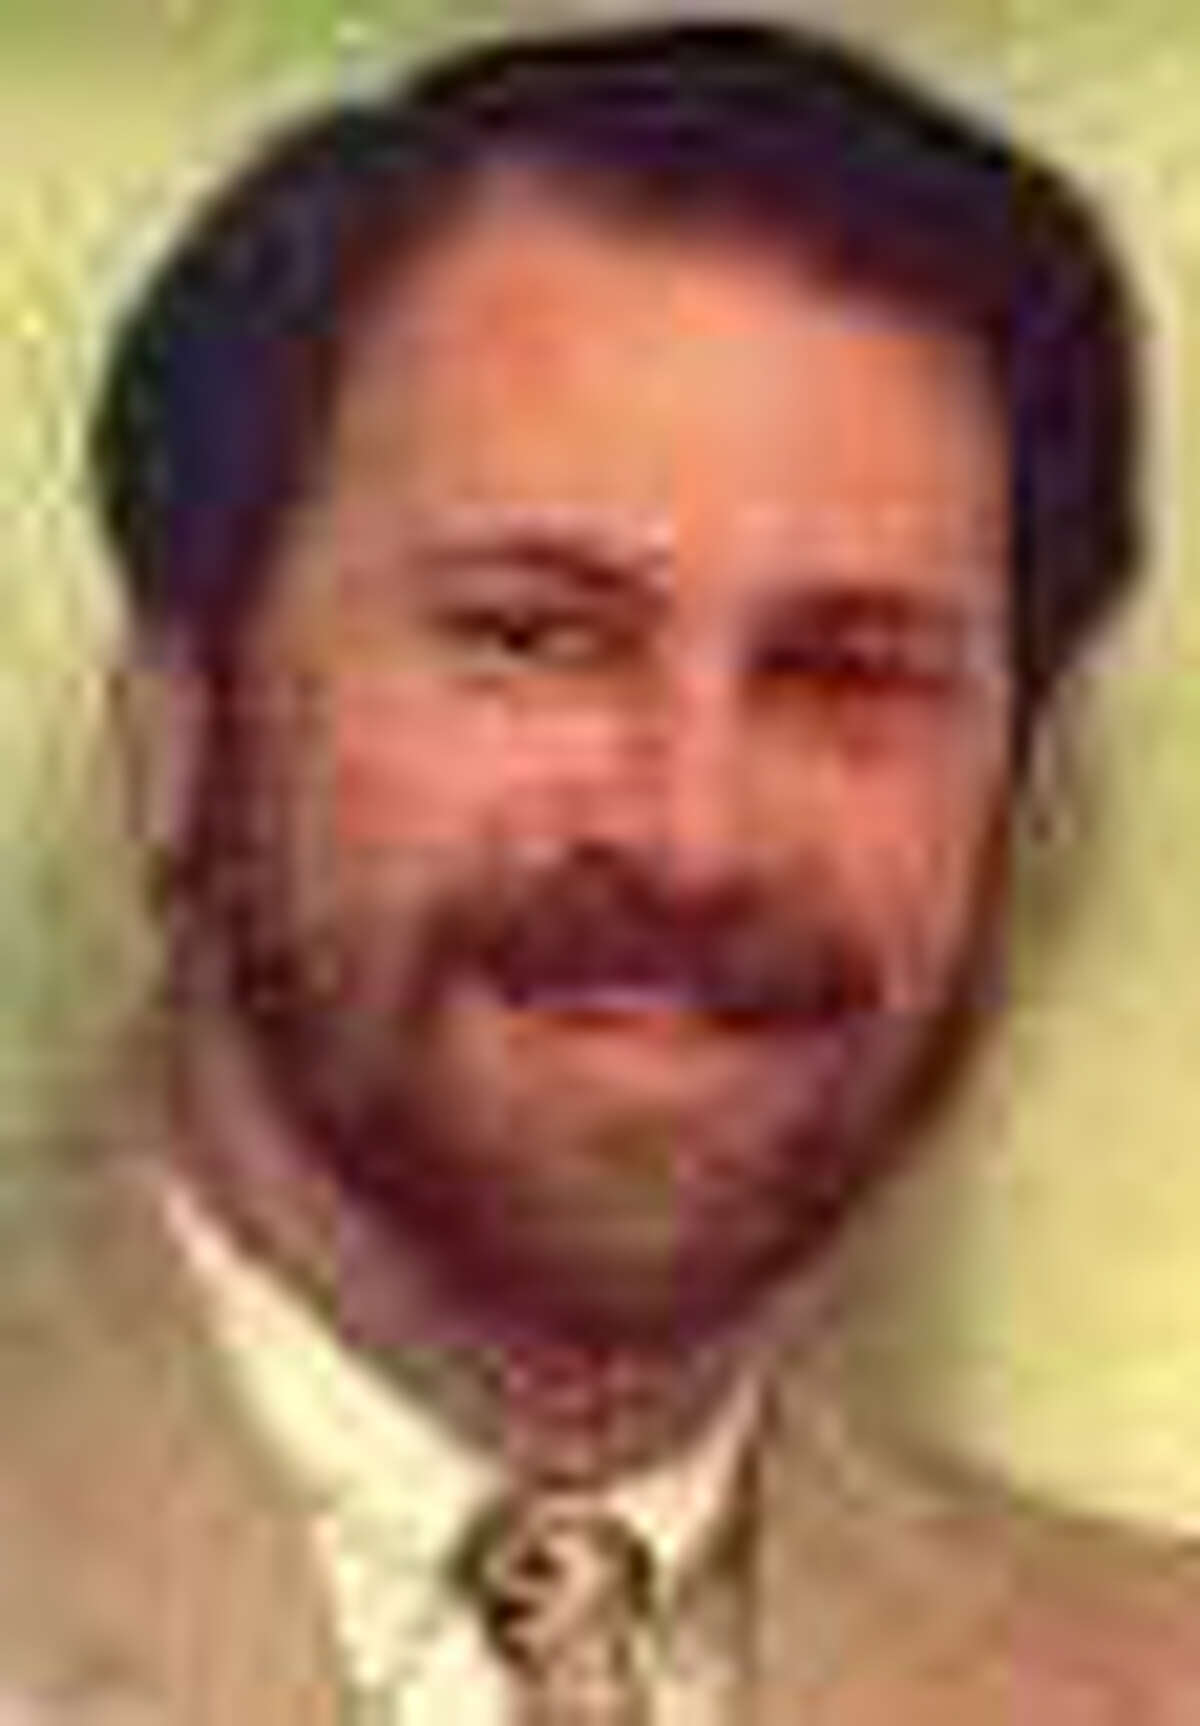 Dr. Richard Salwen